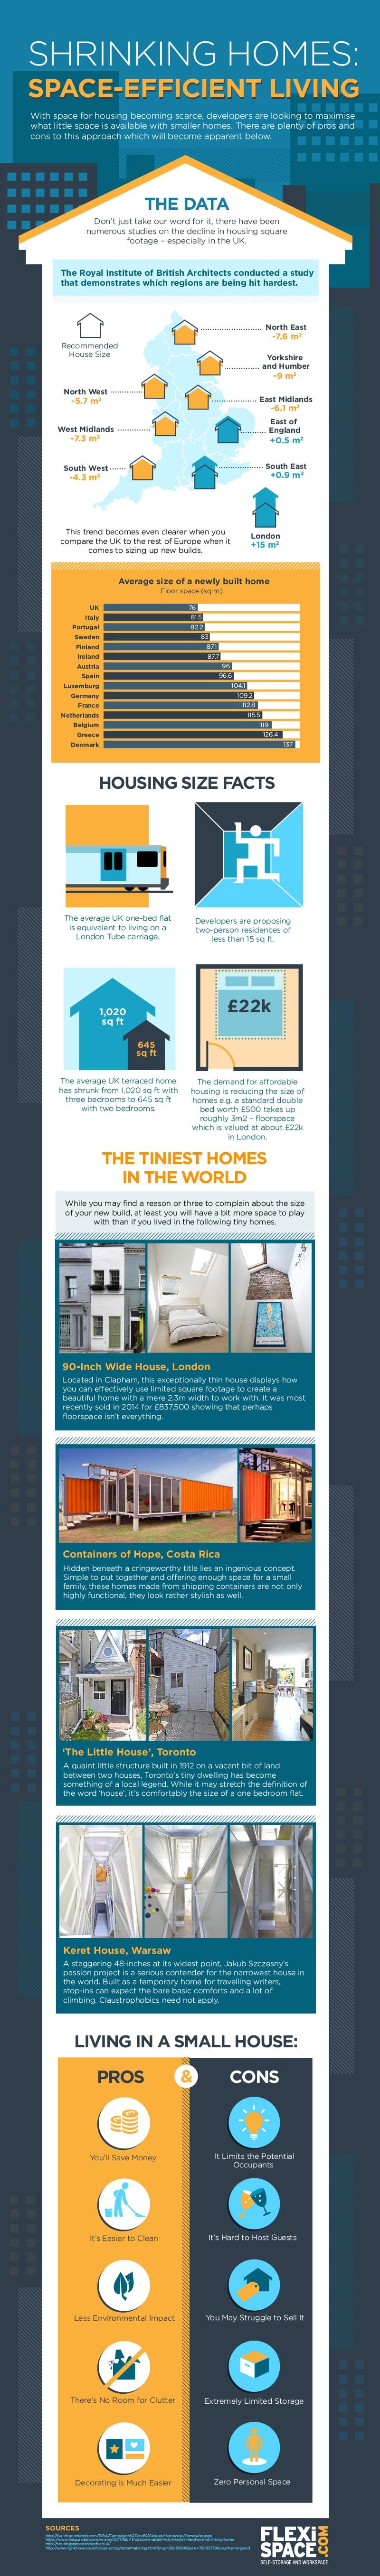 shrinking houses - houses getting smaller infographic